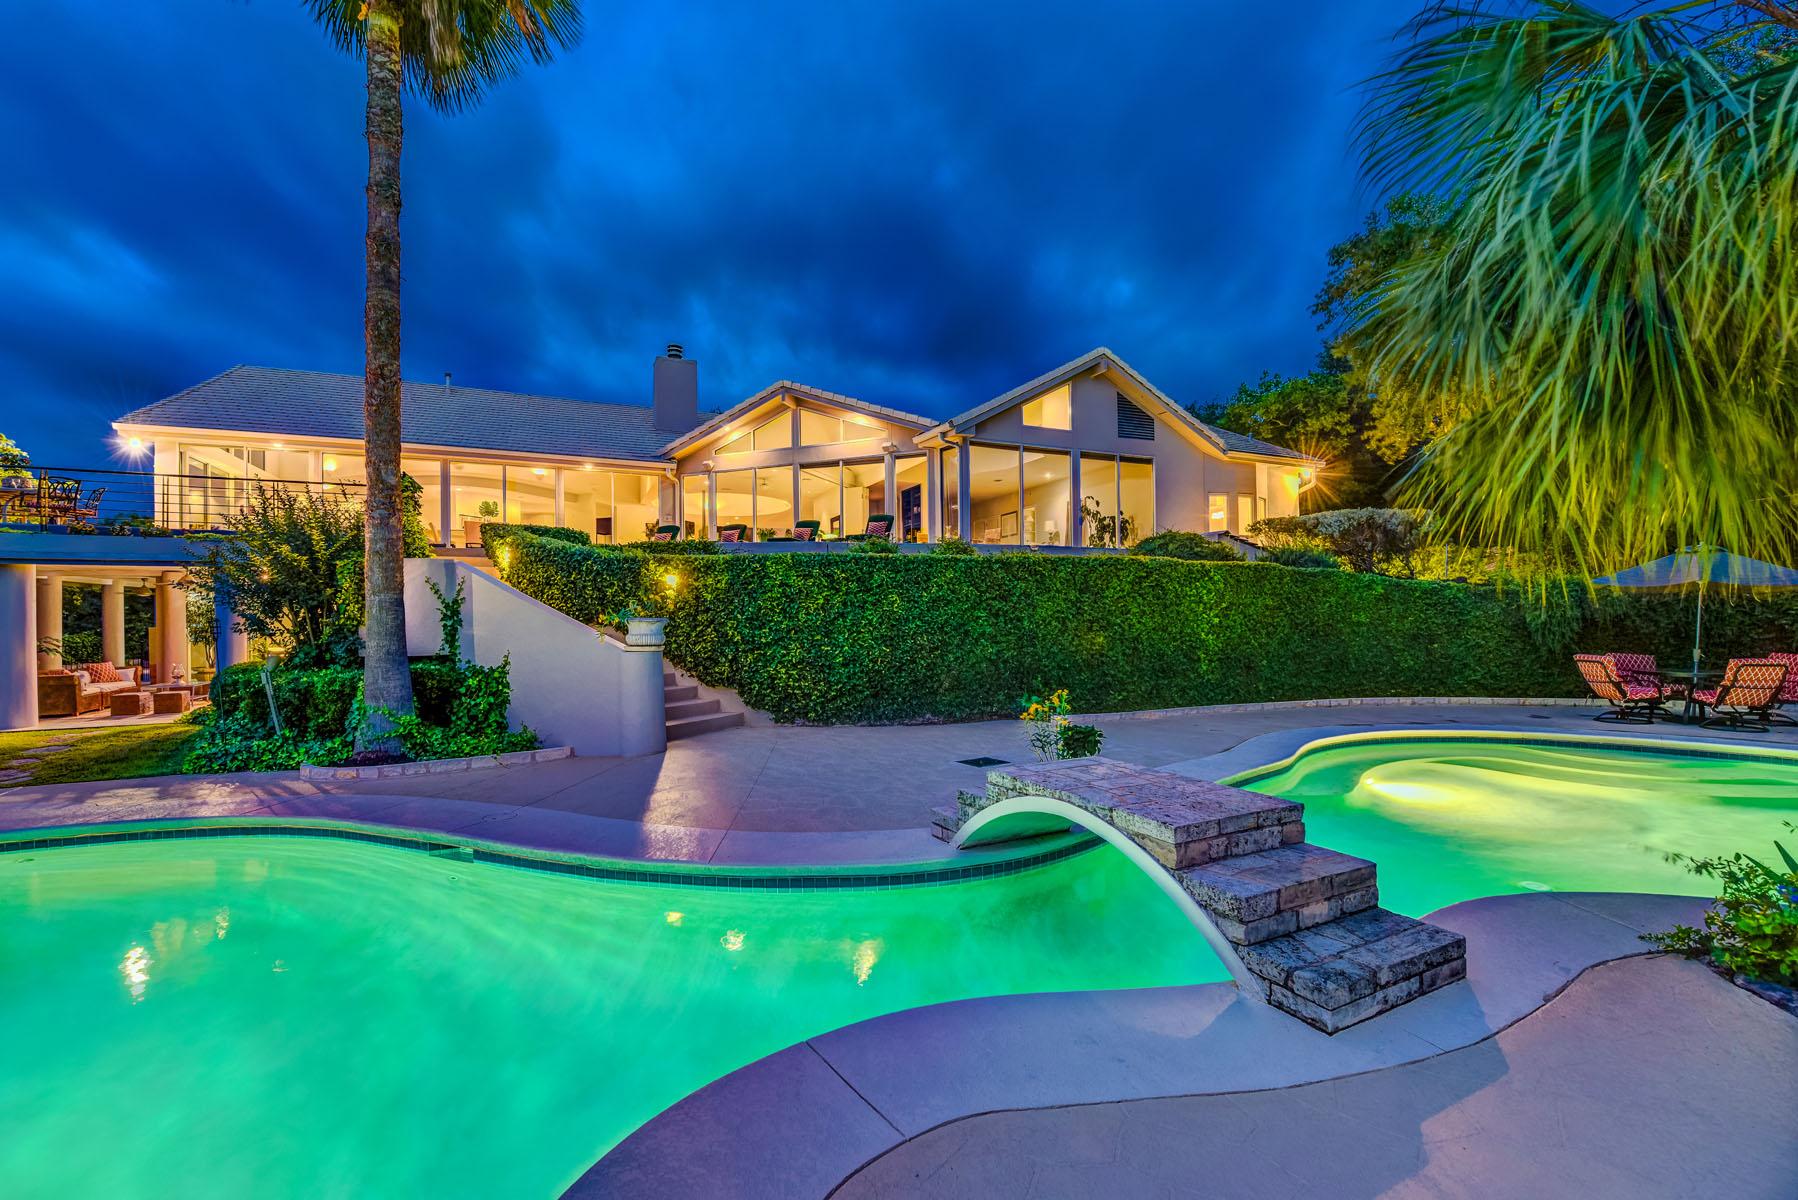 Single Family Home for Sale at The Crown Jewel of Barton Creek 3304 Barton Creek Blvd Austin, Texas, 78735 United States